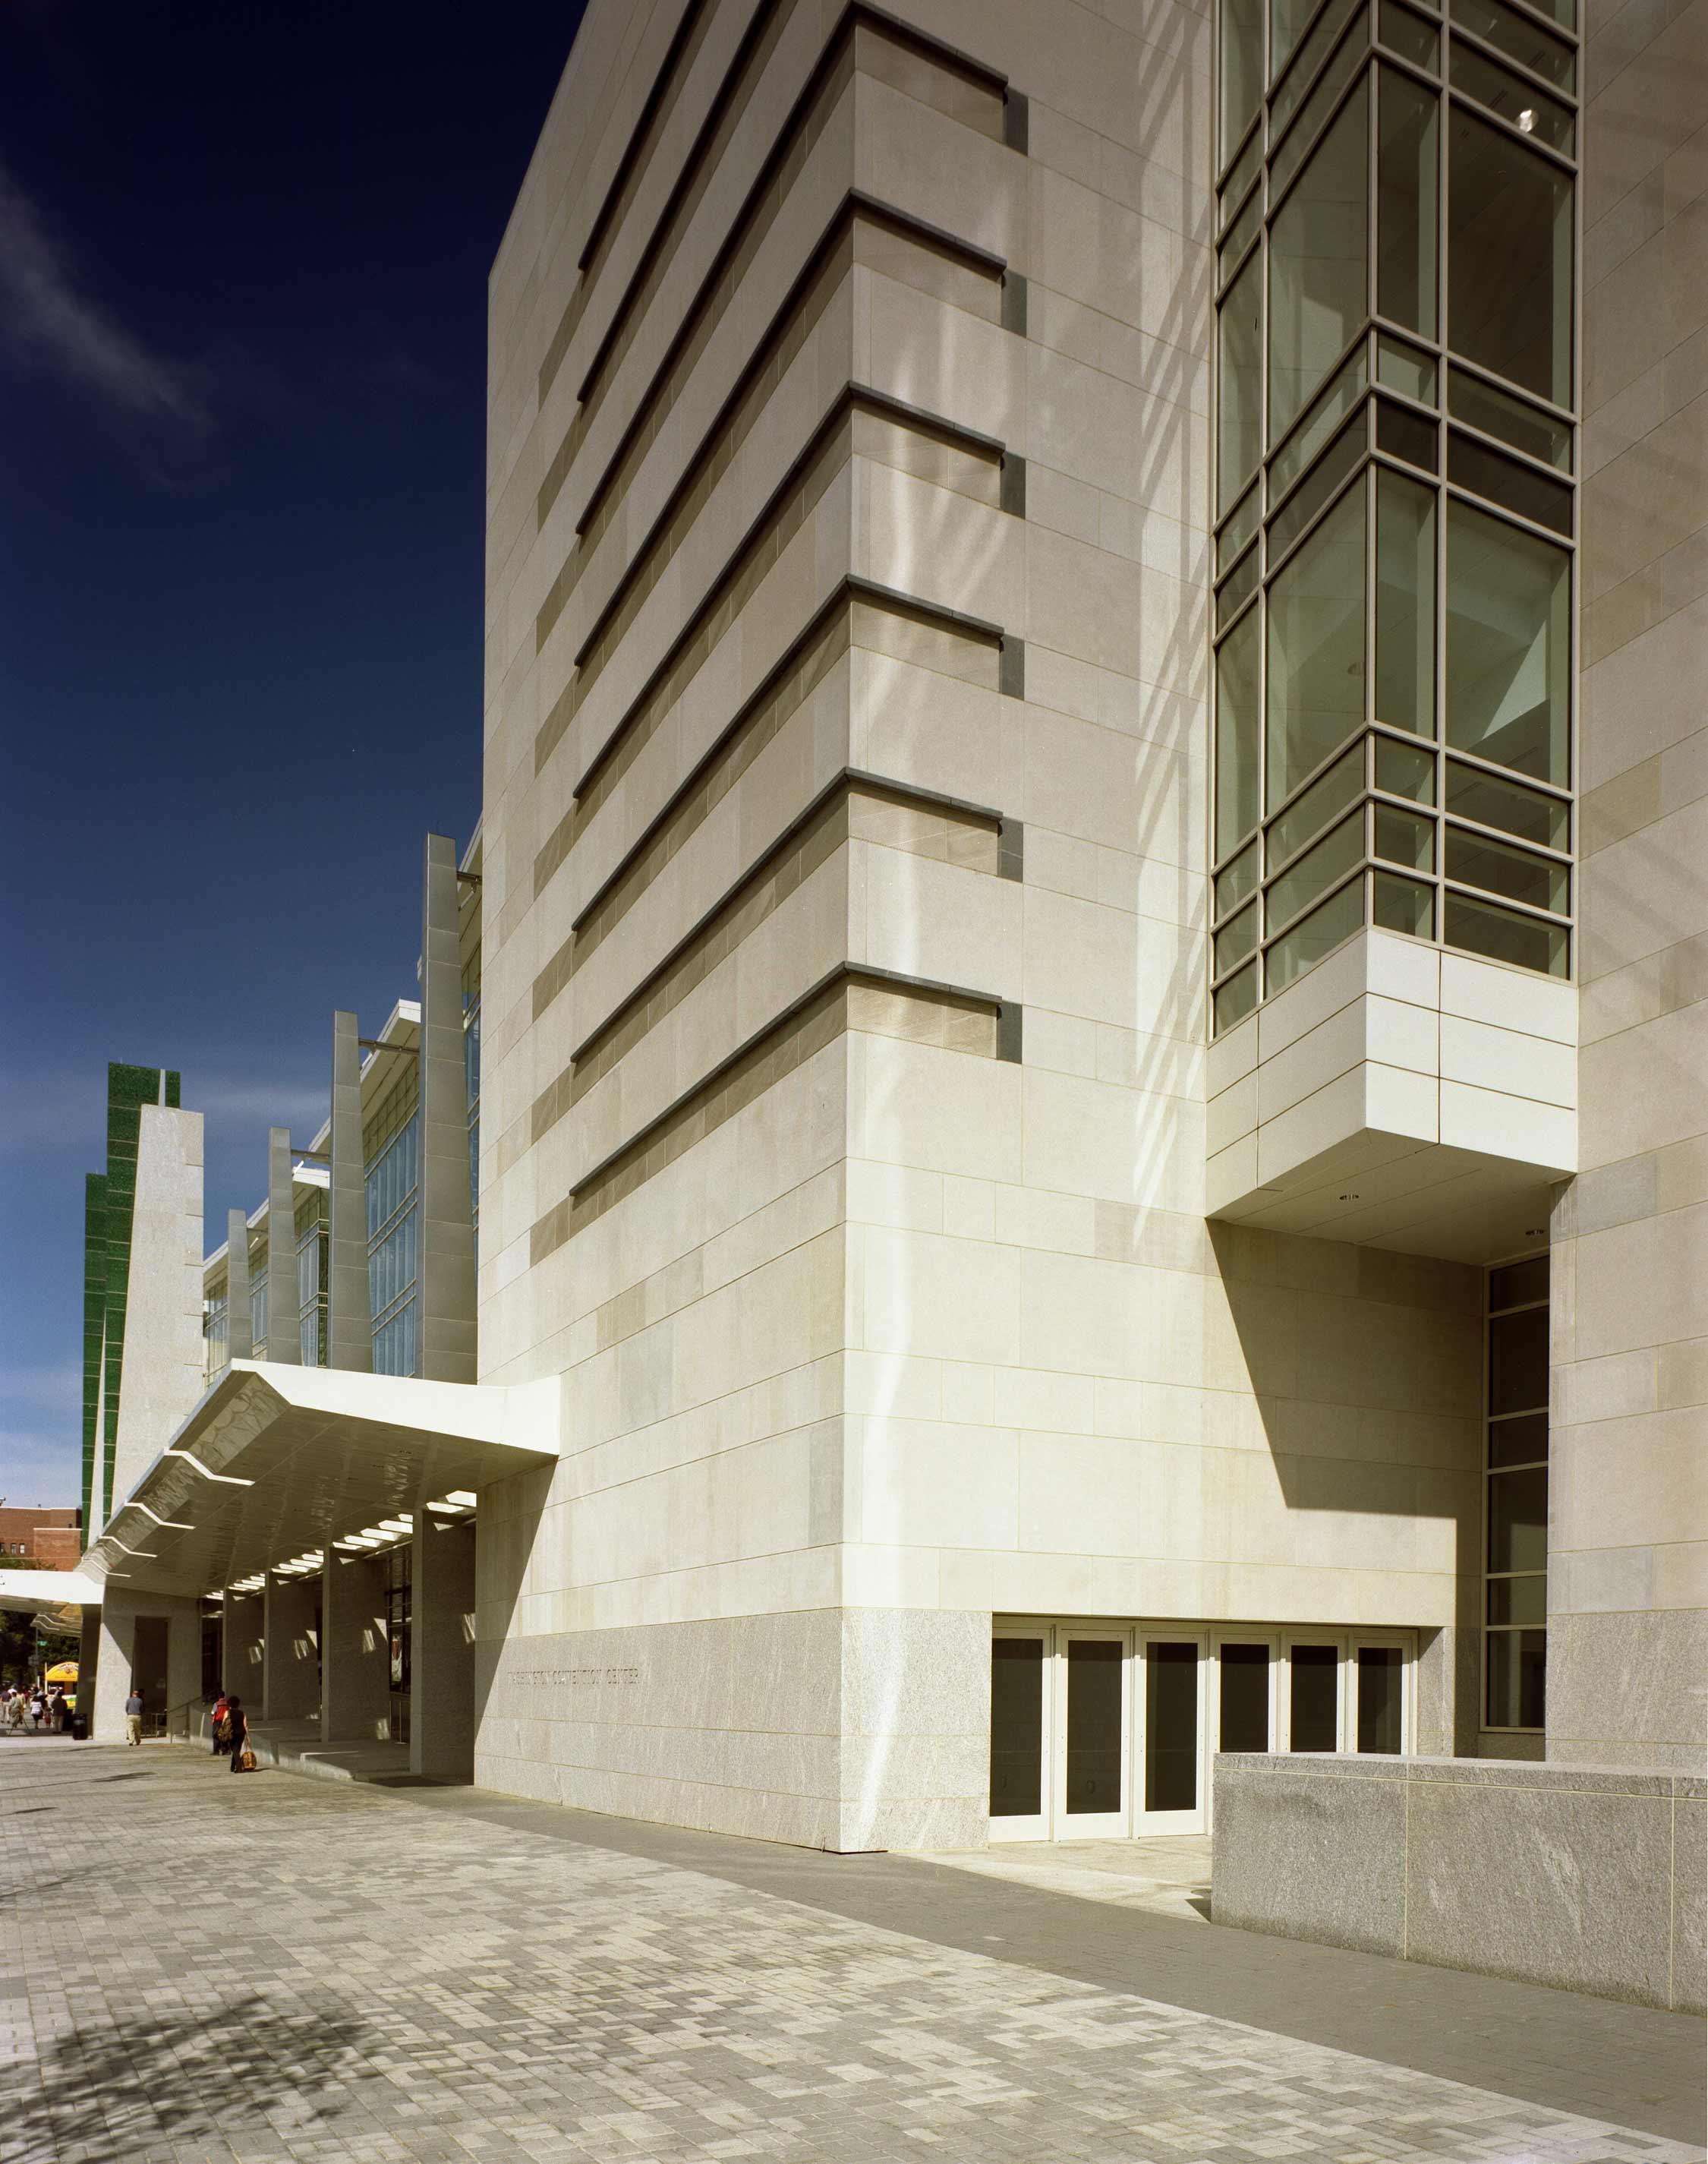 Convention-Center-001-Exterior-1c.jpg